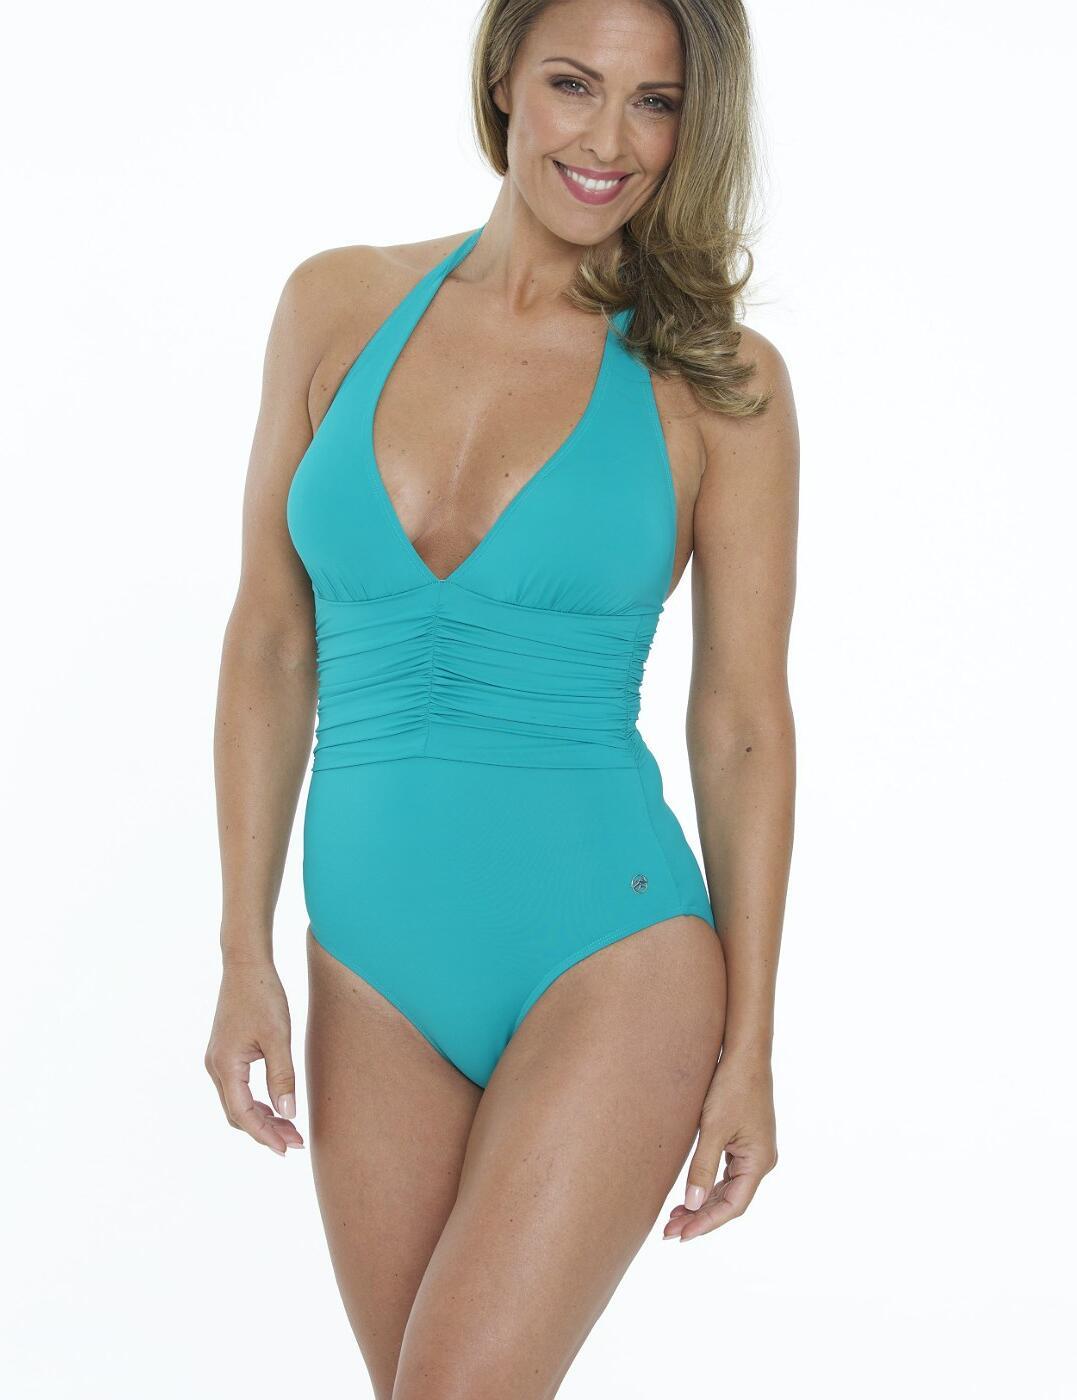 33-2857 SeaSpray Just Colour Plain Plunge Swimsuit - 33-2857 Jade